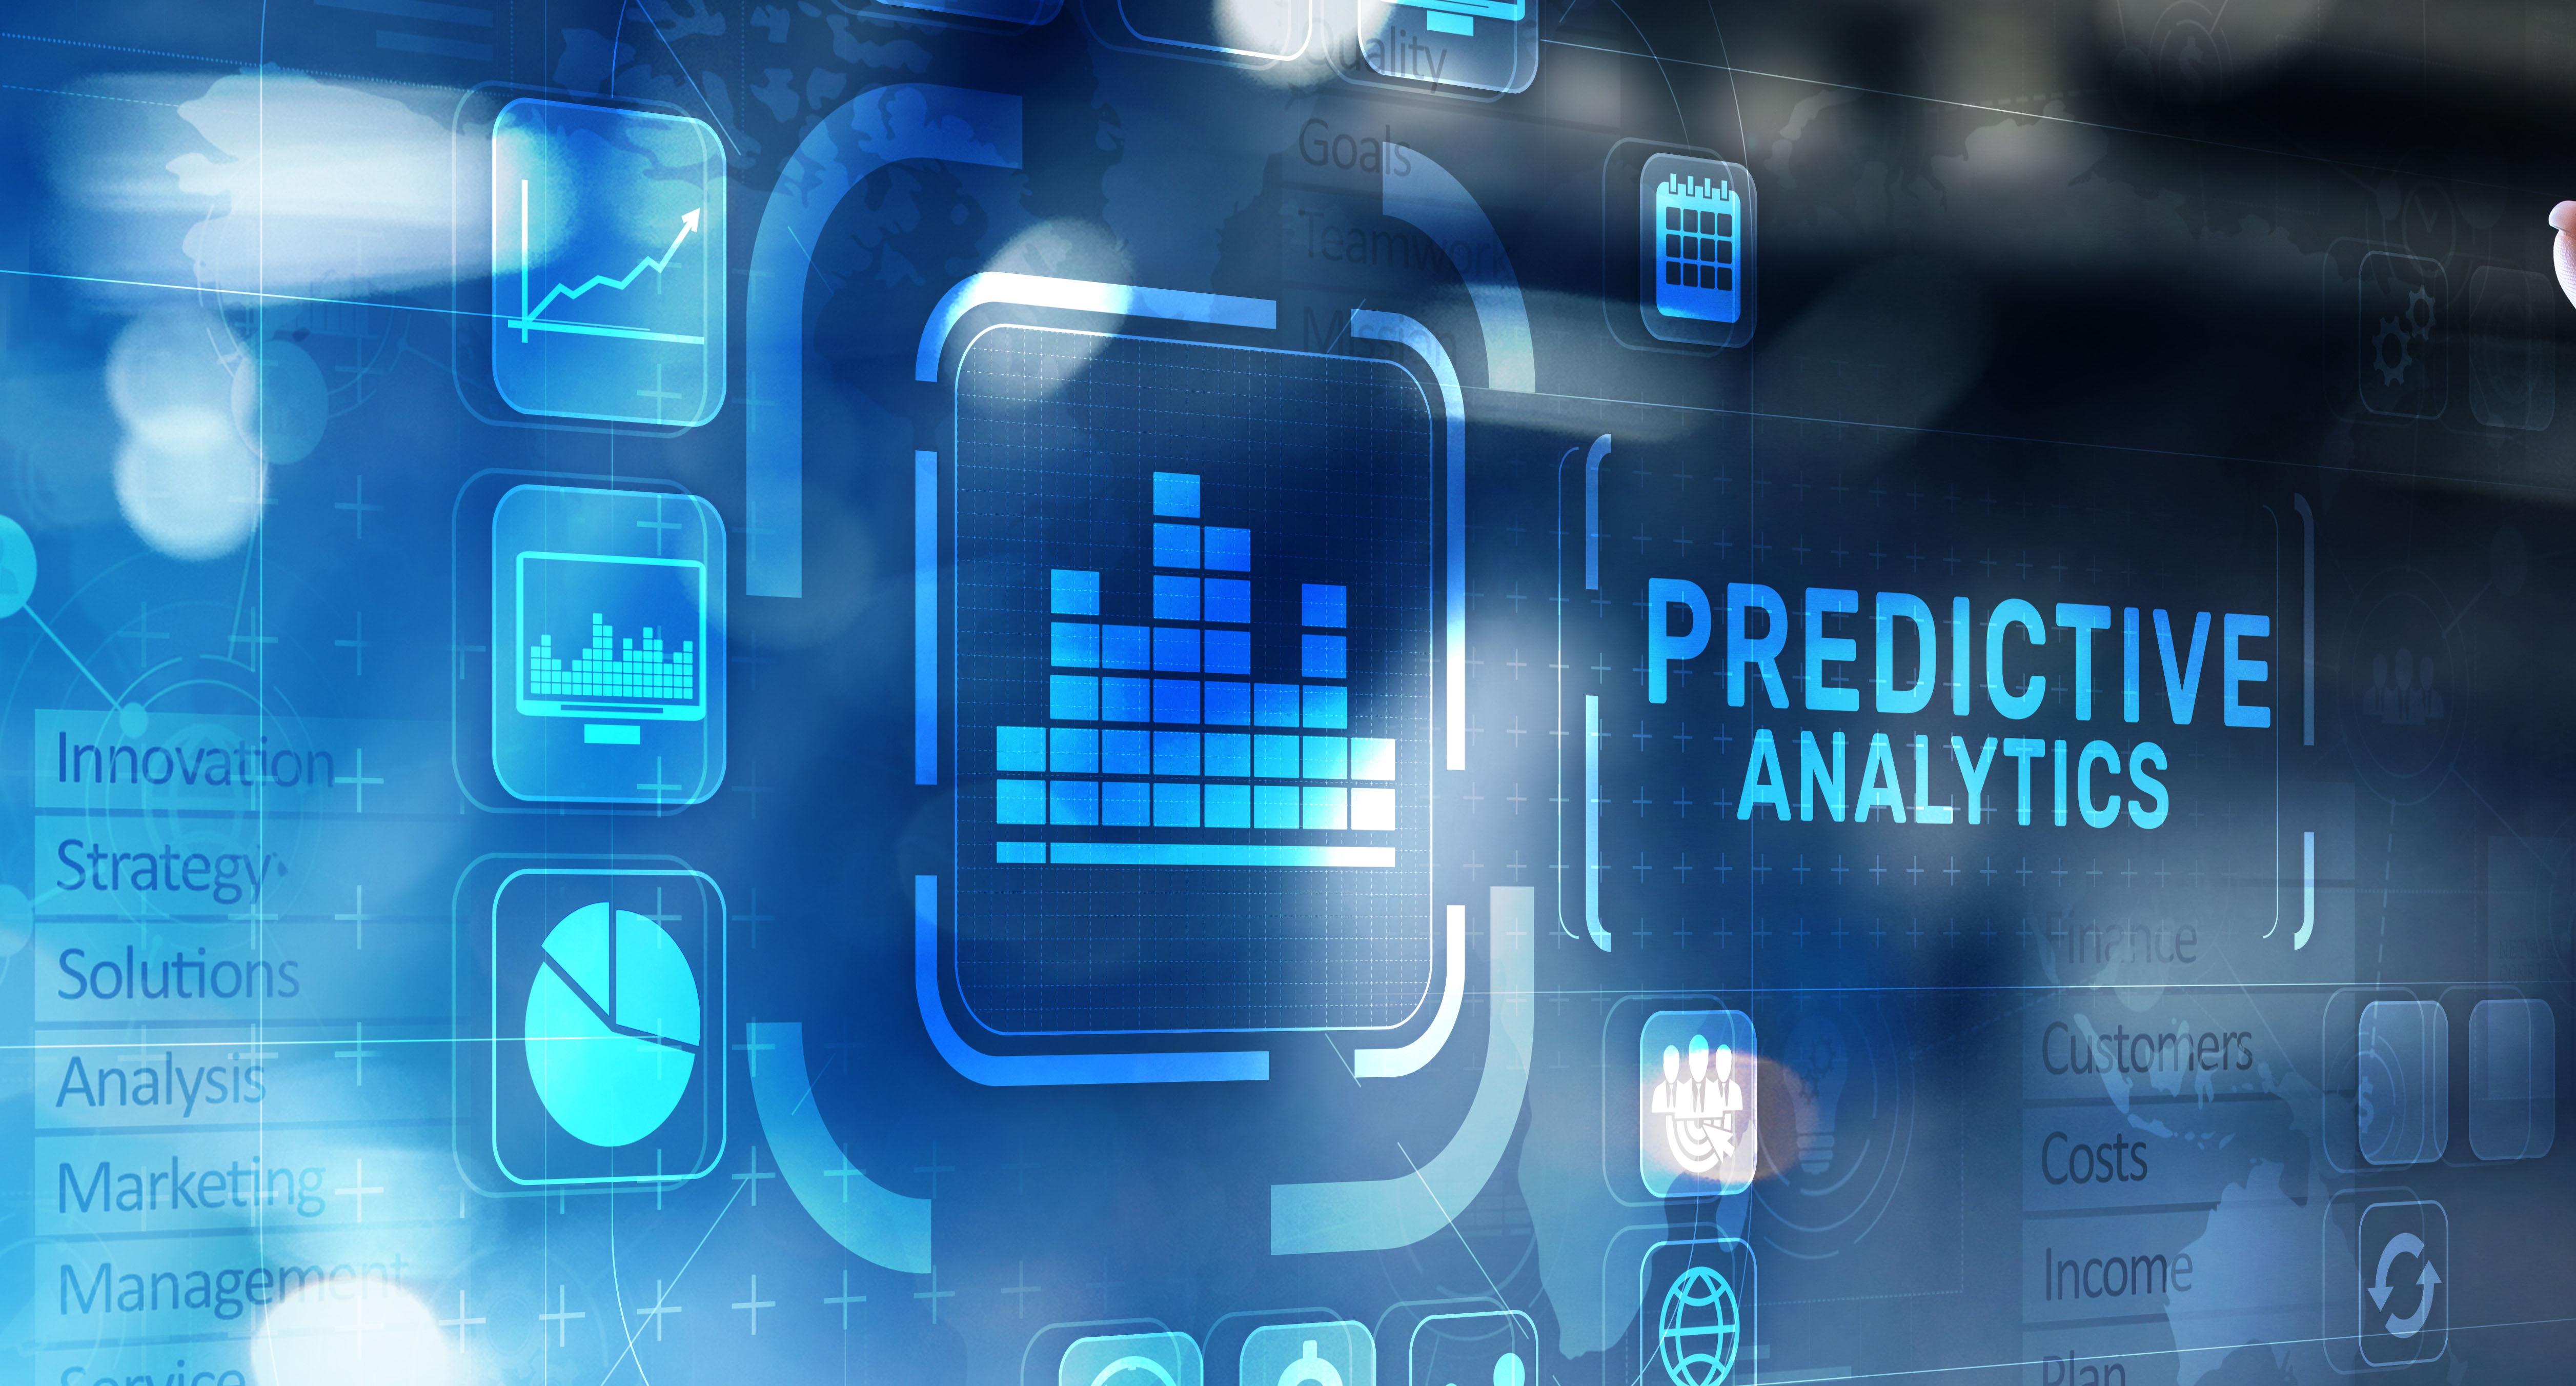 Predictive analytics Big Data analysis Business intelligence internet and modern technology concept on virtual screen.